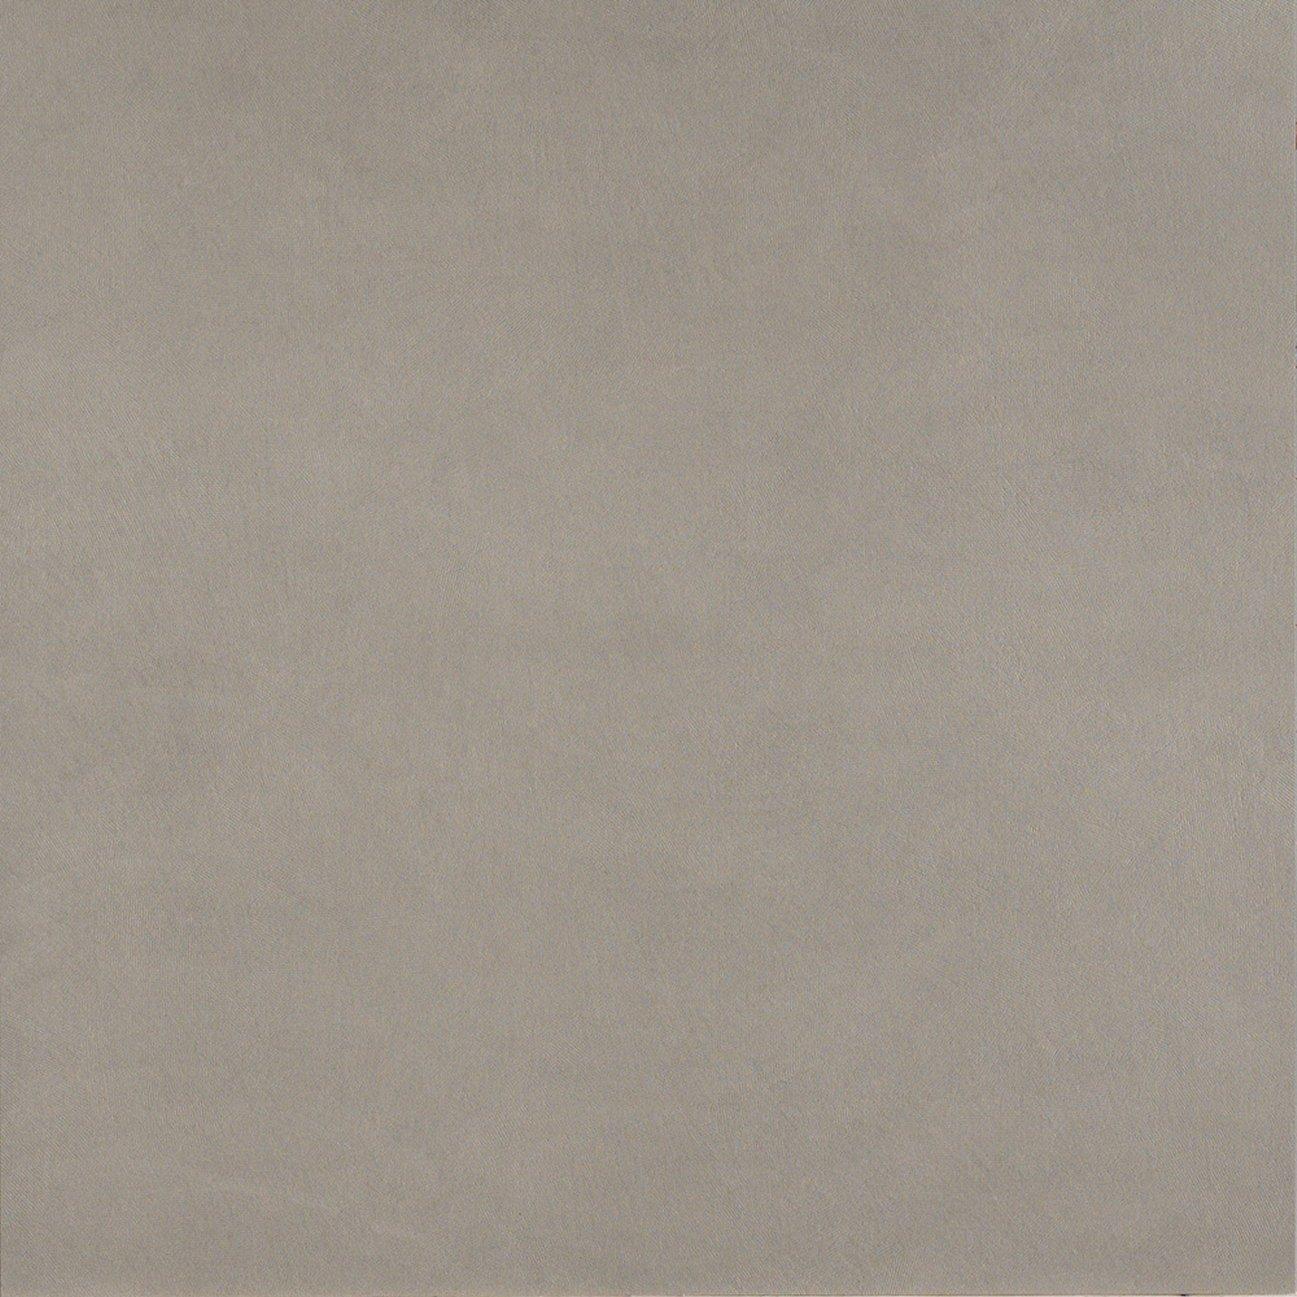 Mutina_Dechirer L. S. Trace cemento 60x60rett.2nd choice €.35sqm